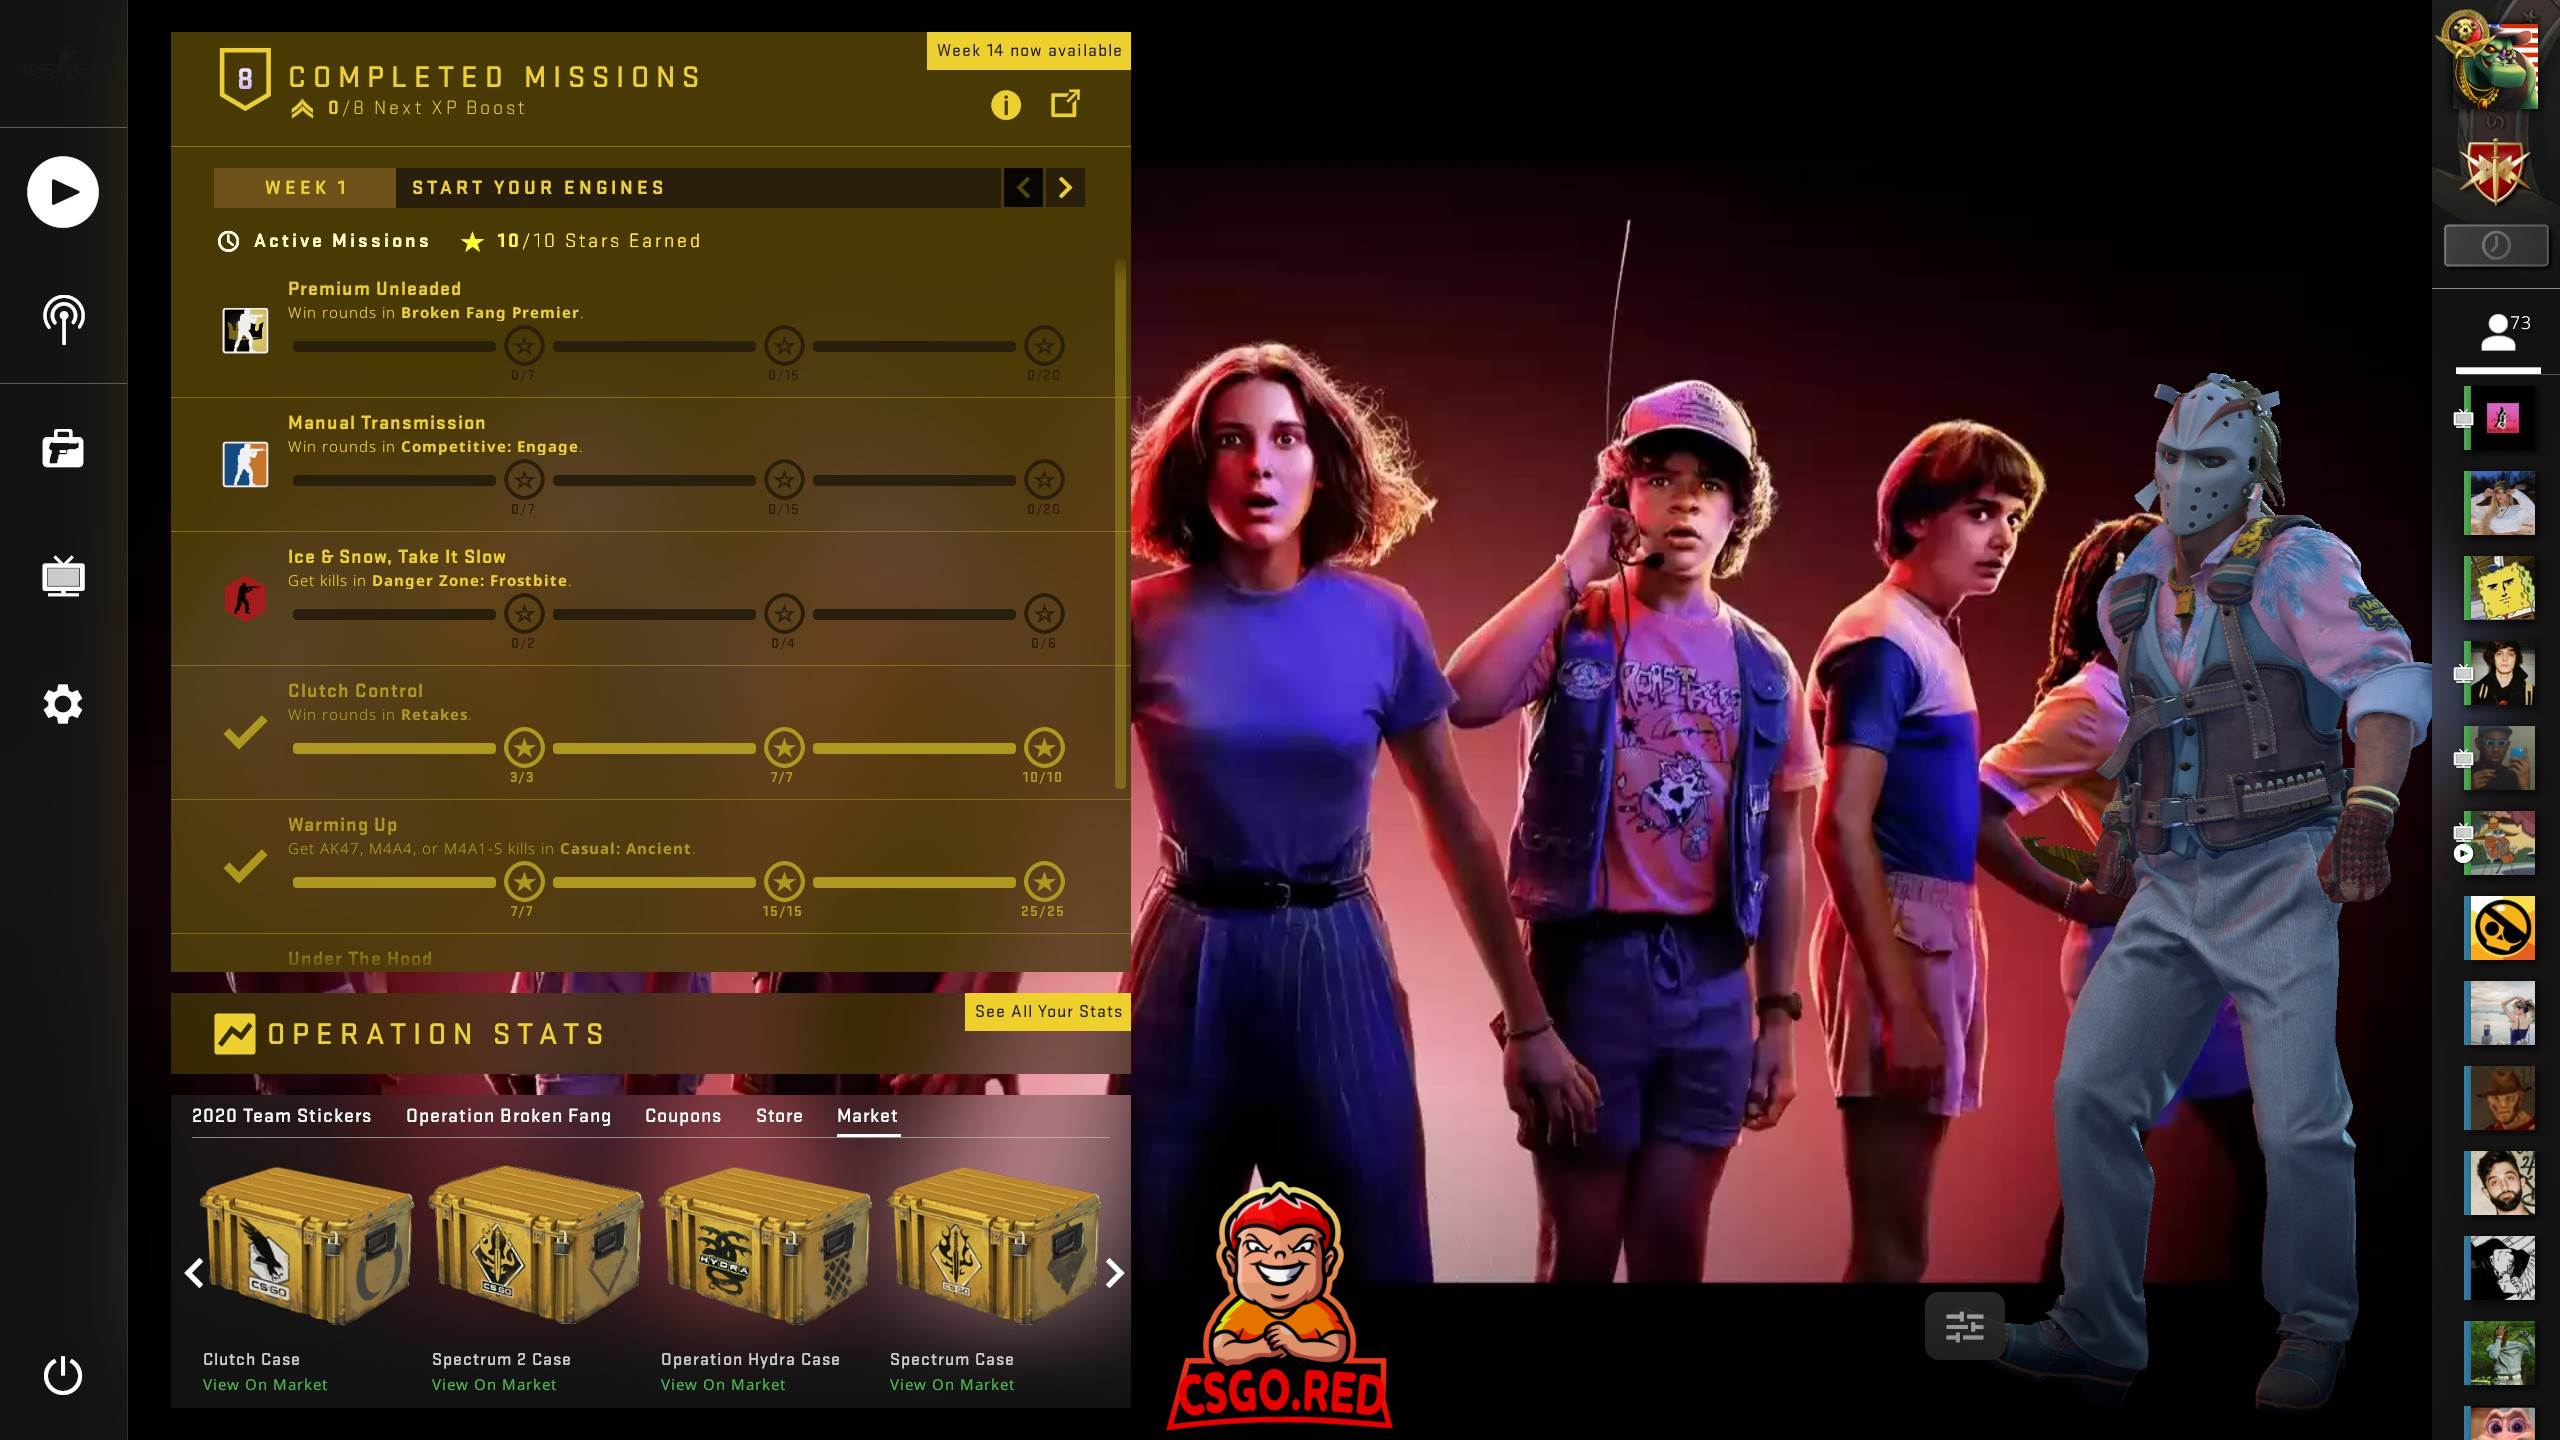 Stranger Things CSGO Panorama UI Preview